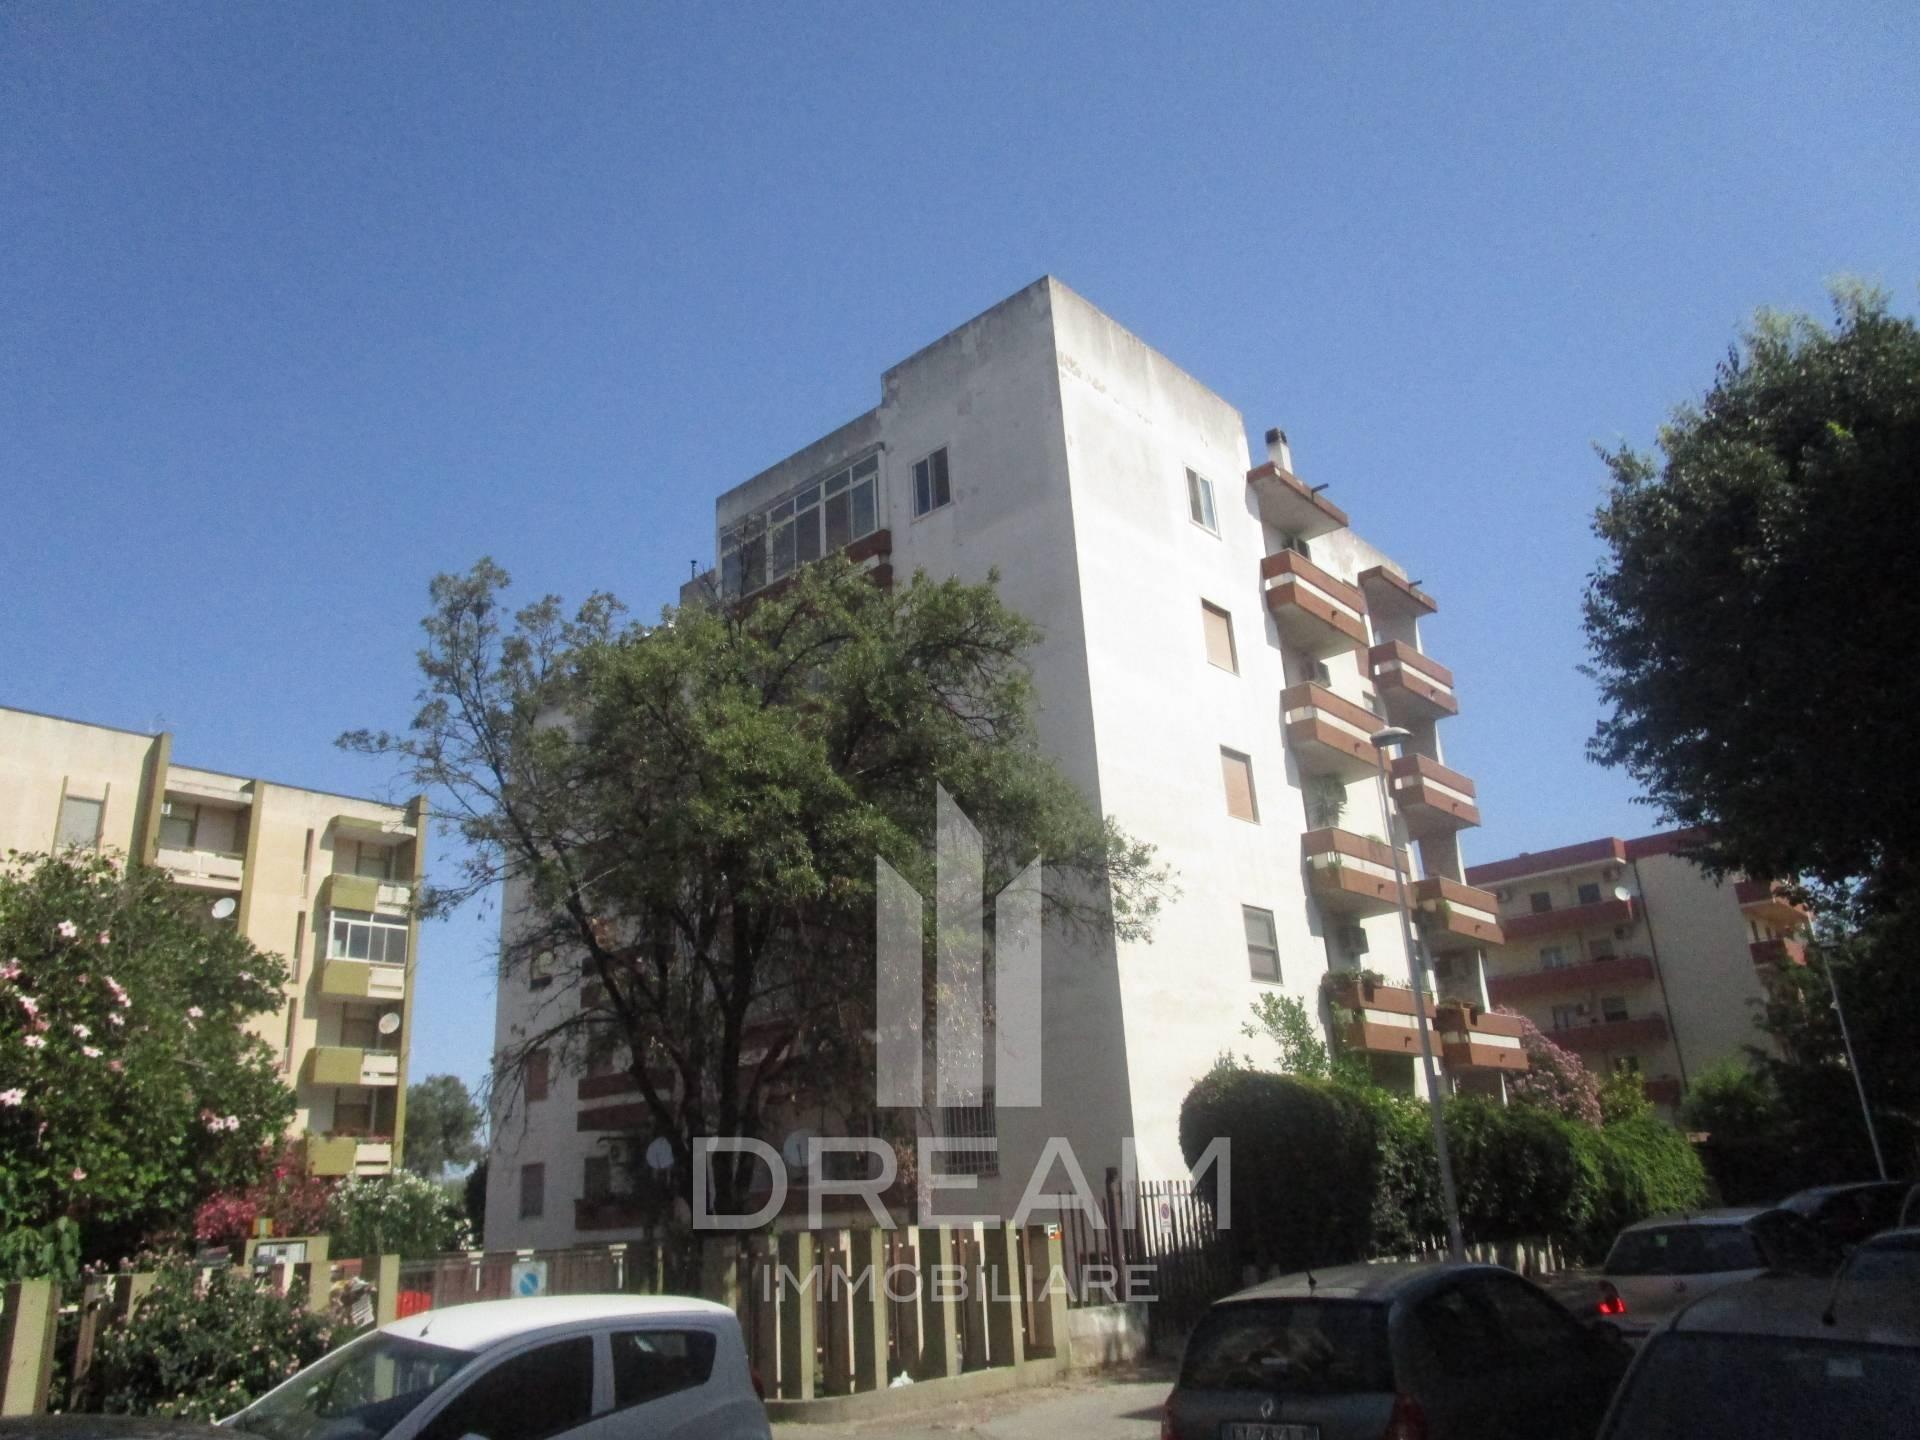 Ufficio Postale A Quartu Sant Elena : Appartamento in vendita a quartu santelena cod. a674